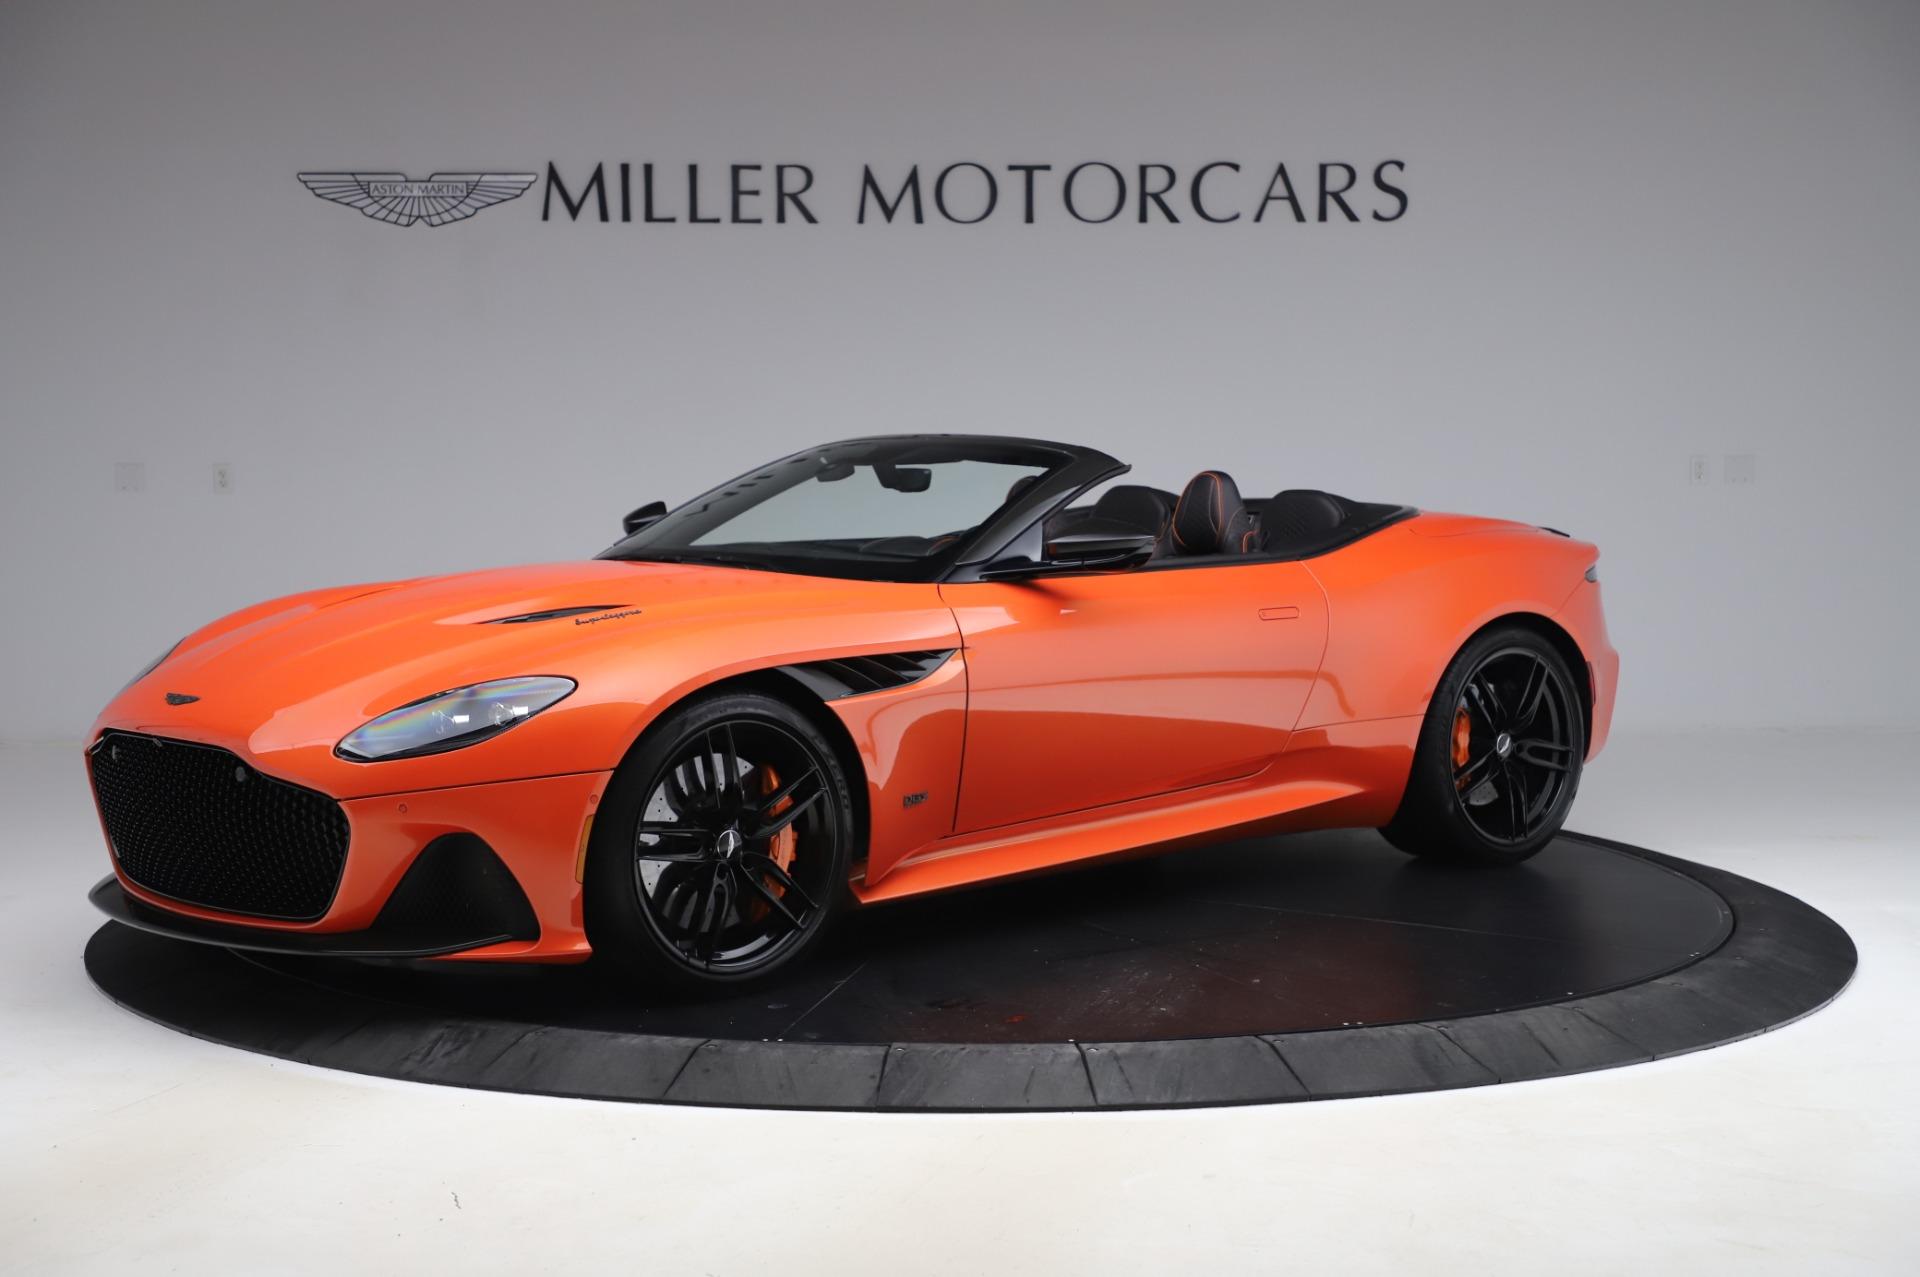 Used 2020 Aston Martin DBS Superleggera for sale $339,900 at Maserati of Westport in Westport CT 06880 1